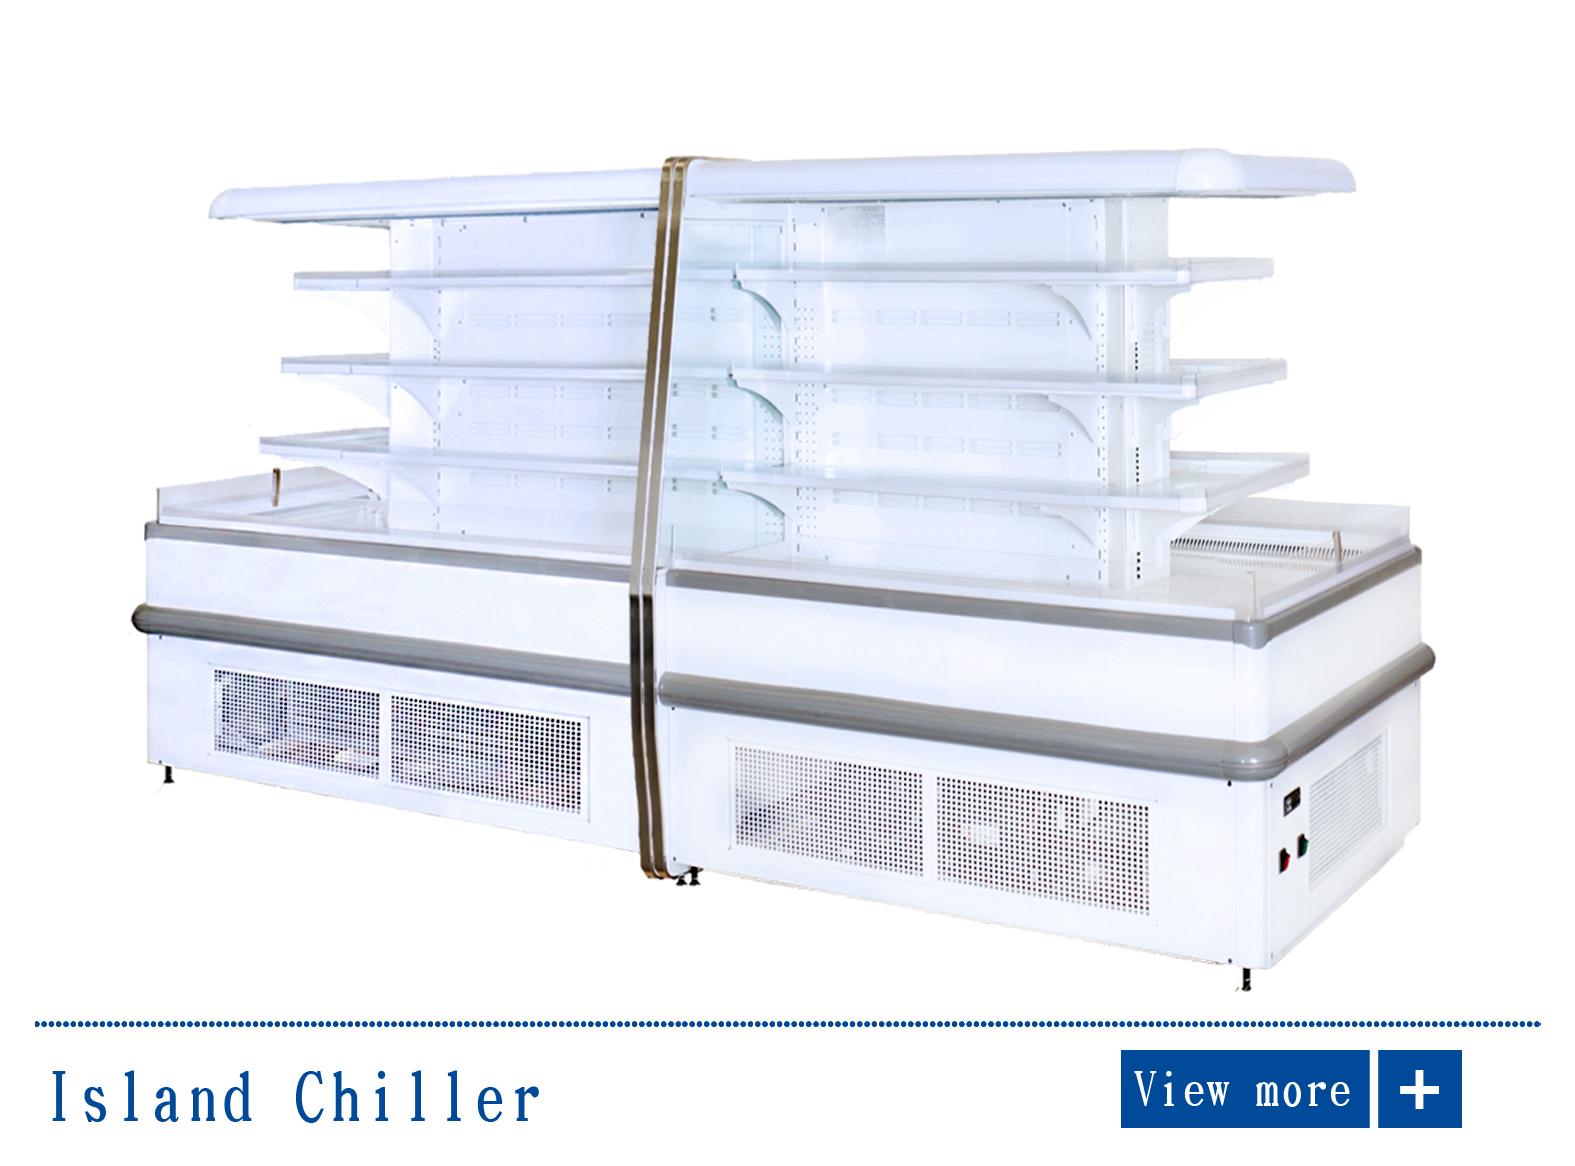 Convenience Store Semi Vertical Refrigerator